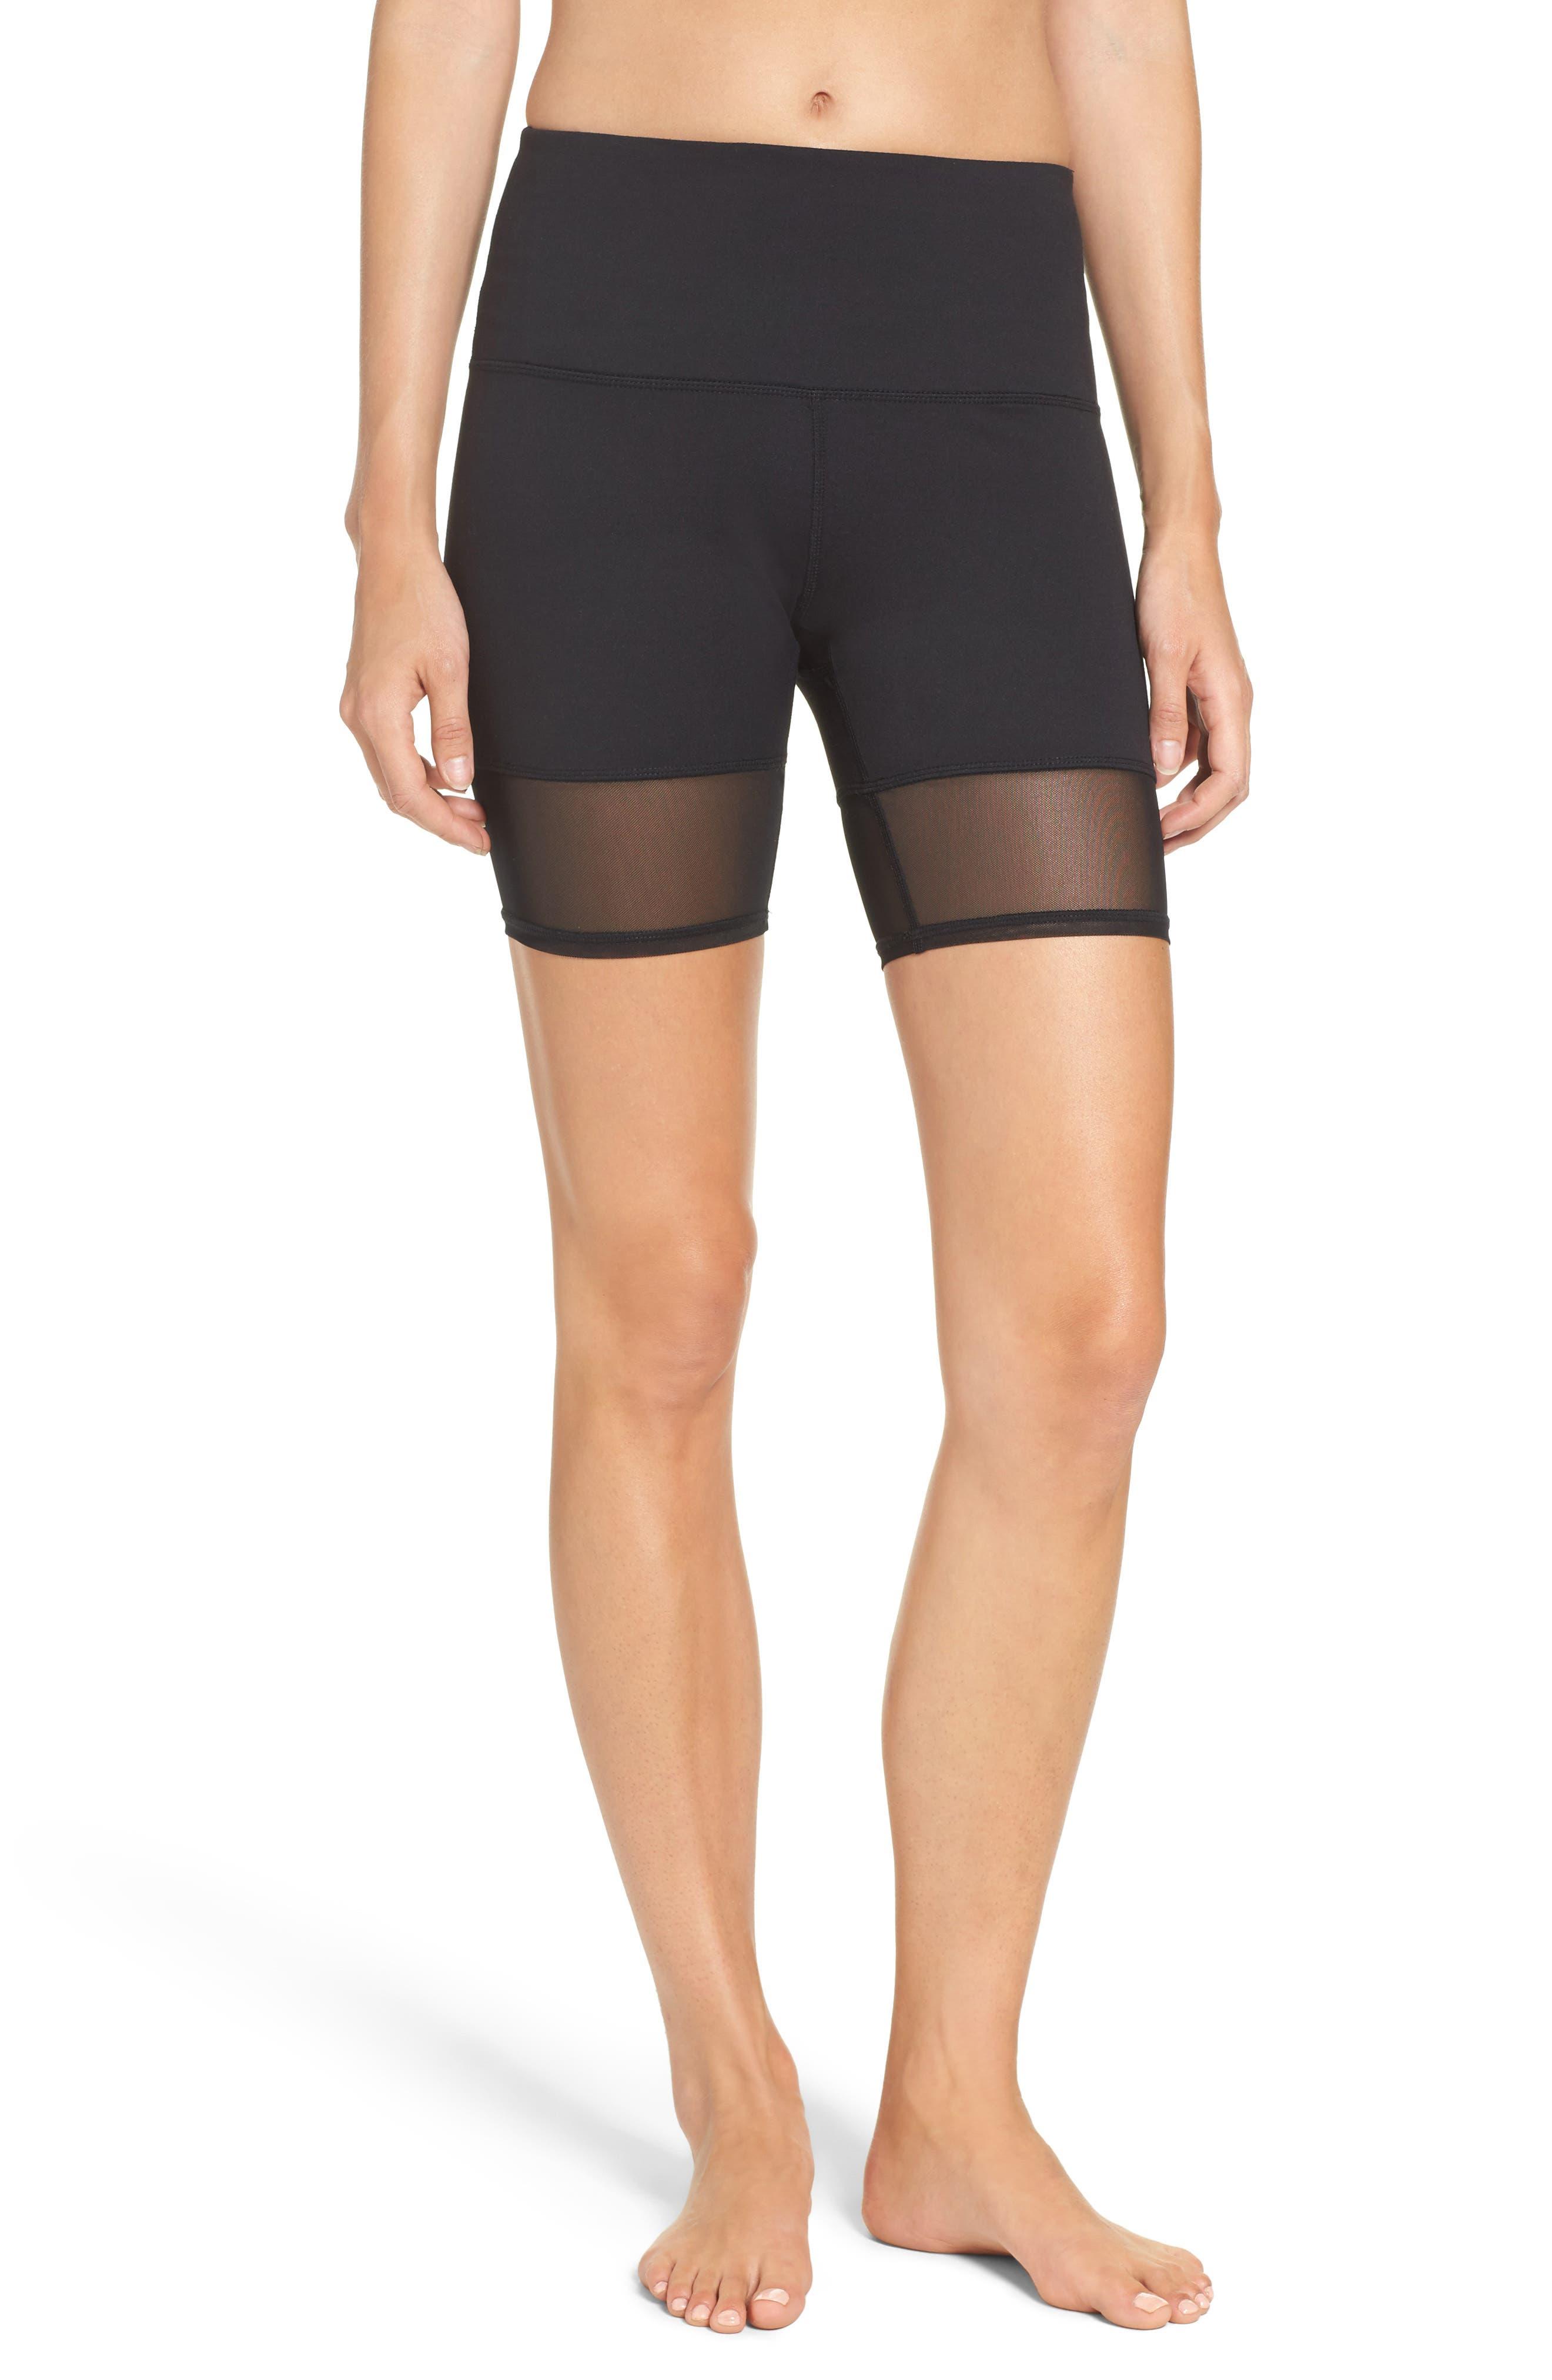 Zella Mia High Waist Mesh Bike Shorts